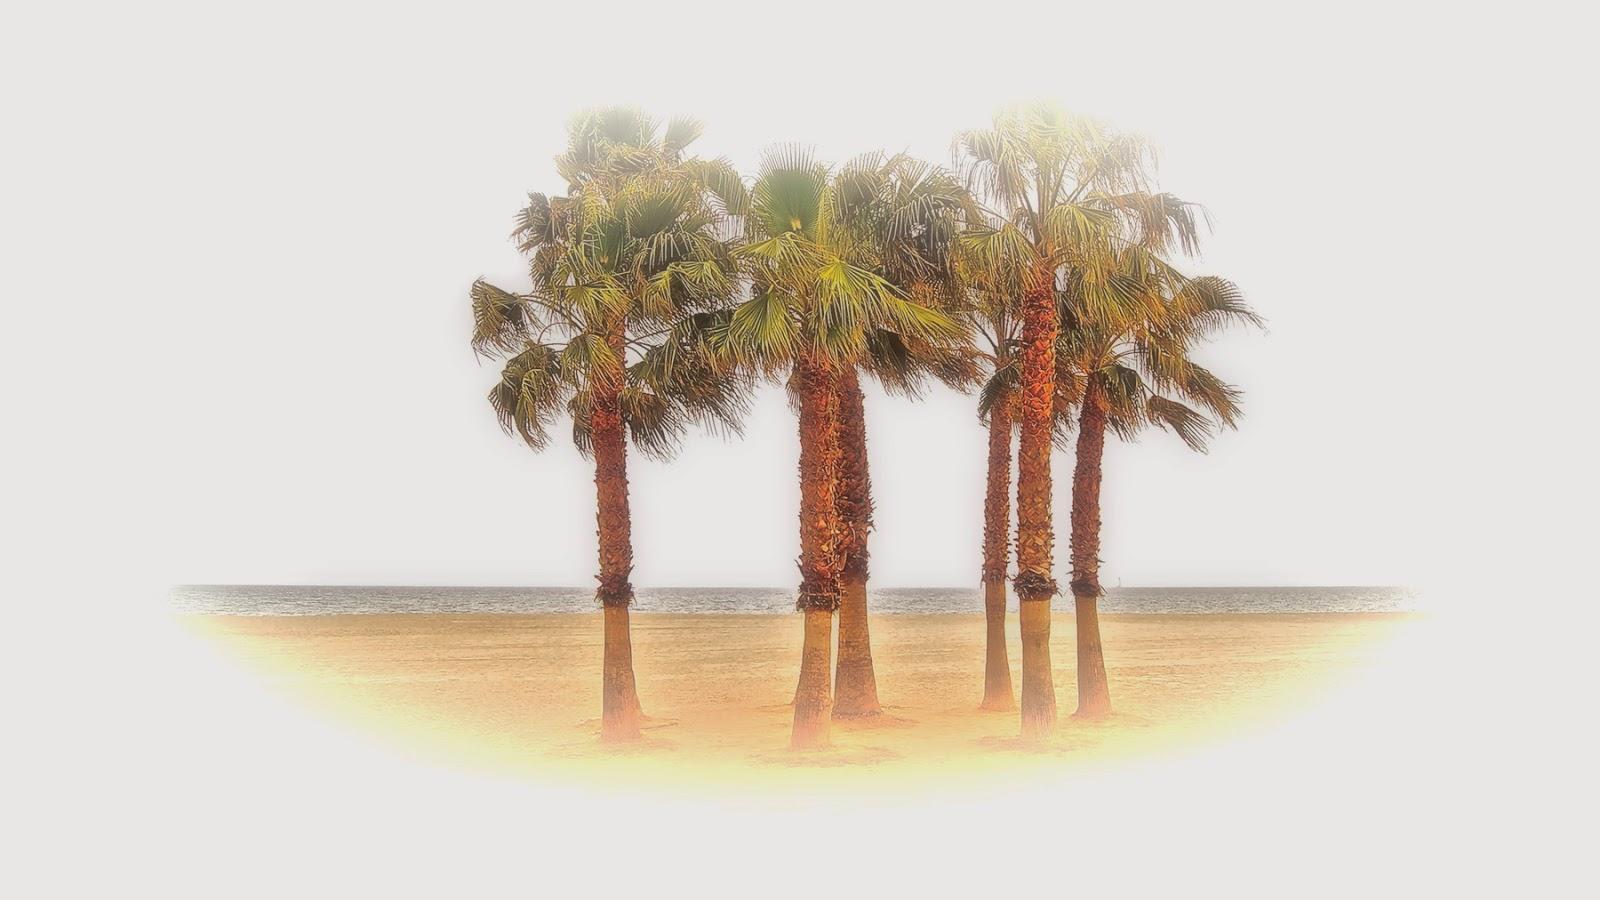 Islalimón la isla de Stimuls